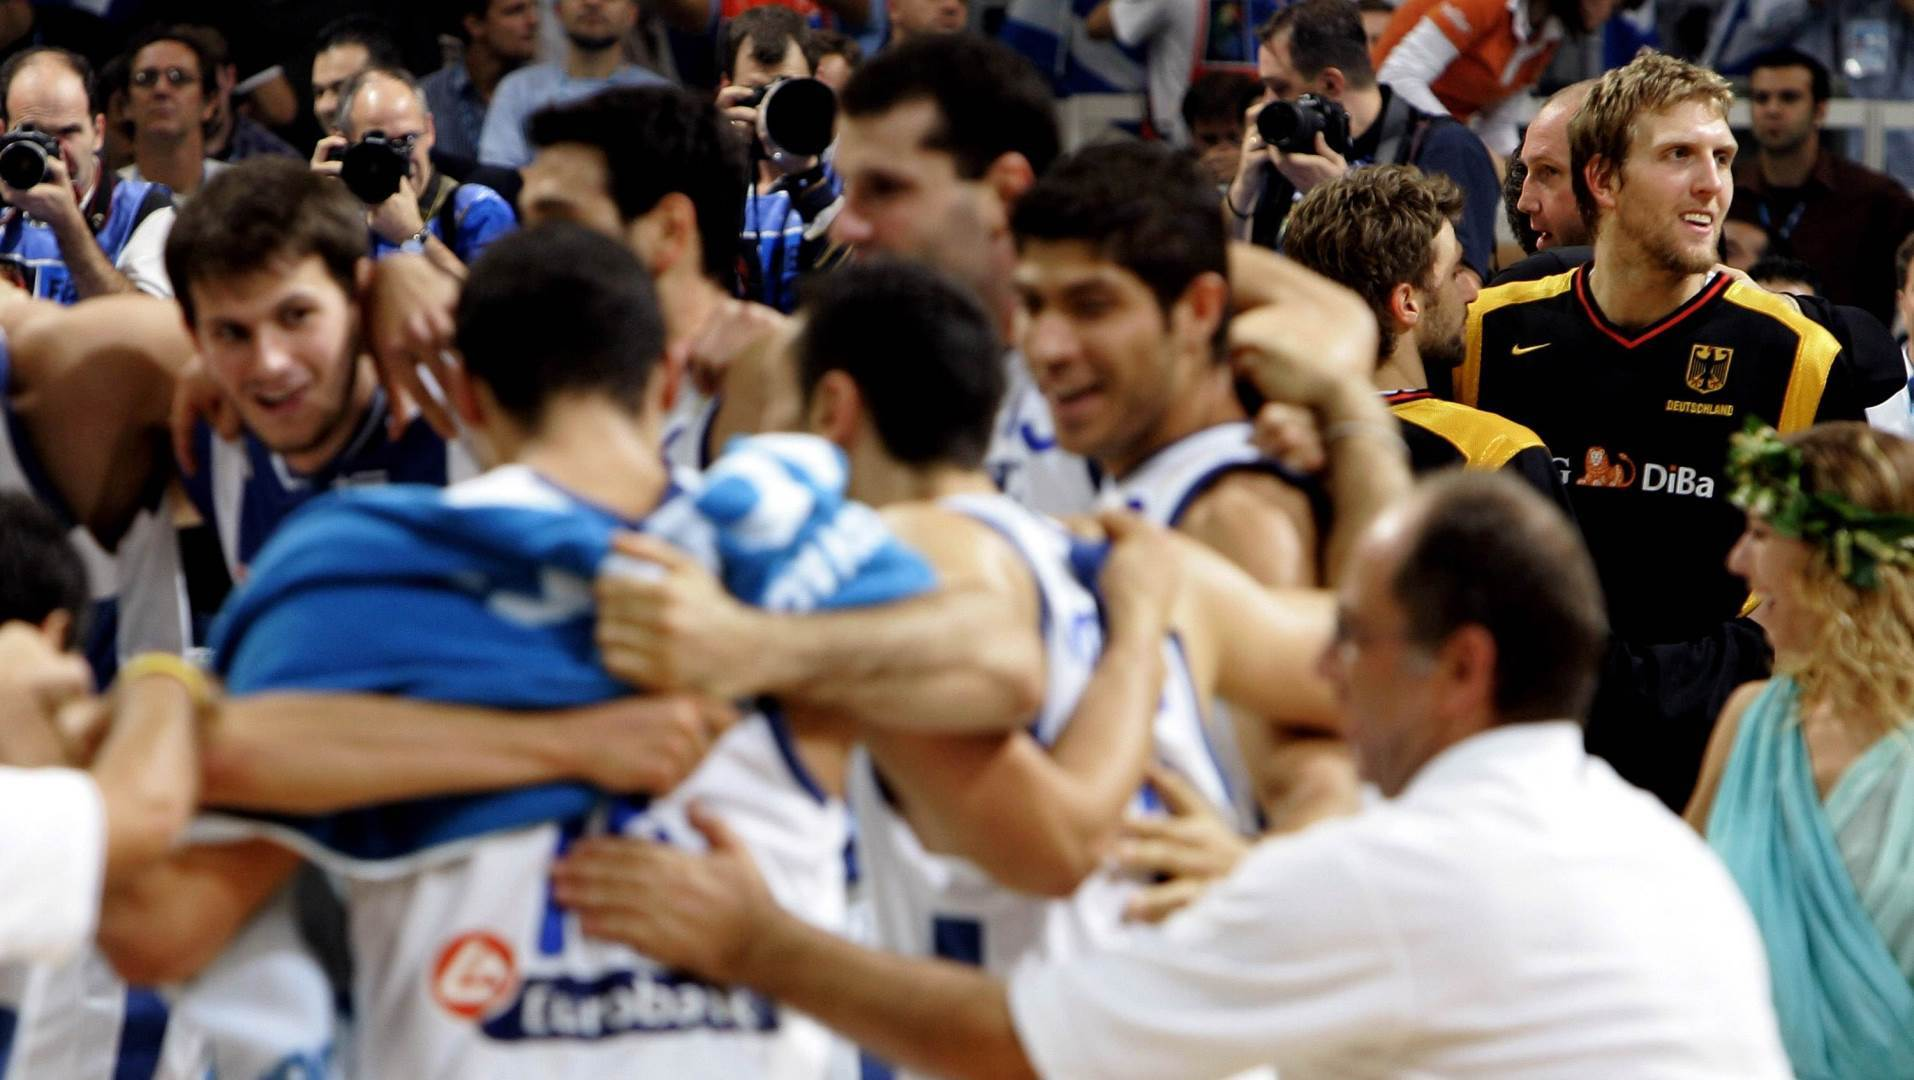 grčka, nemačka, eurobasket 2005